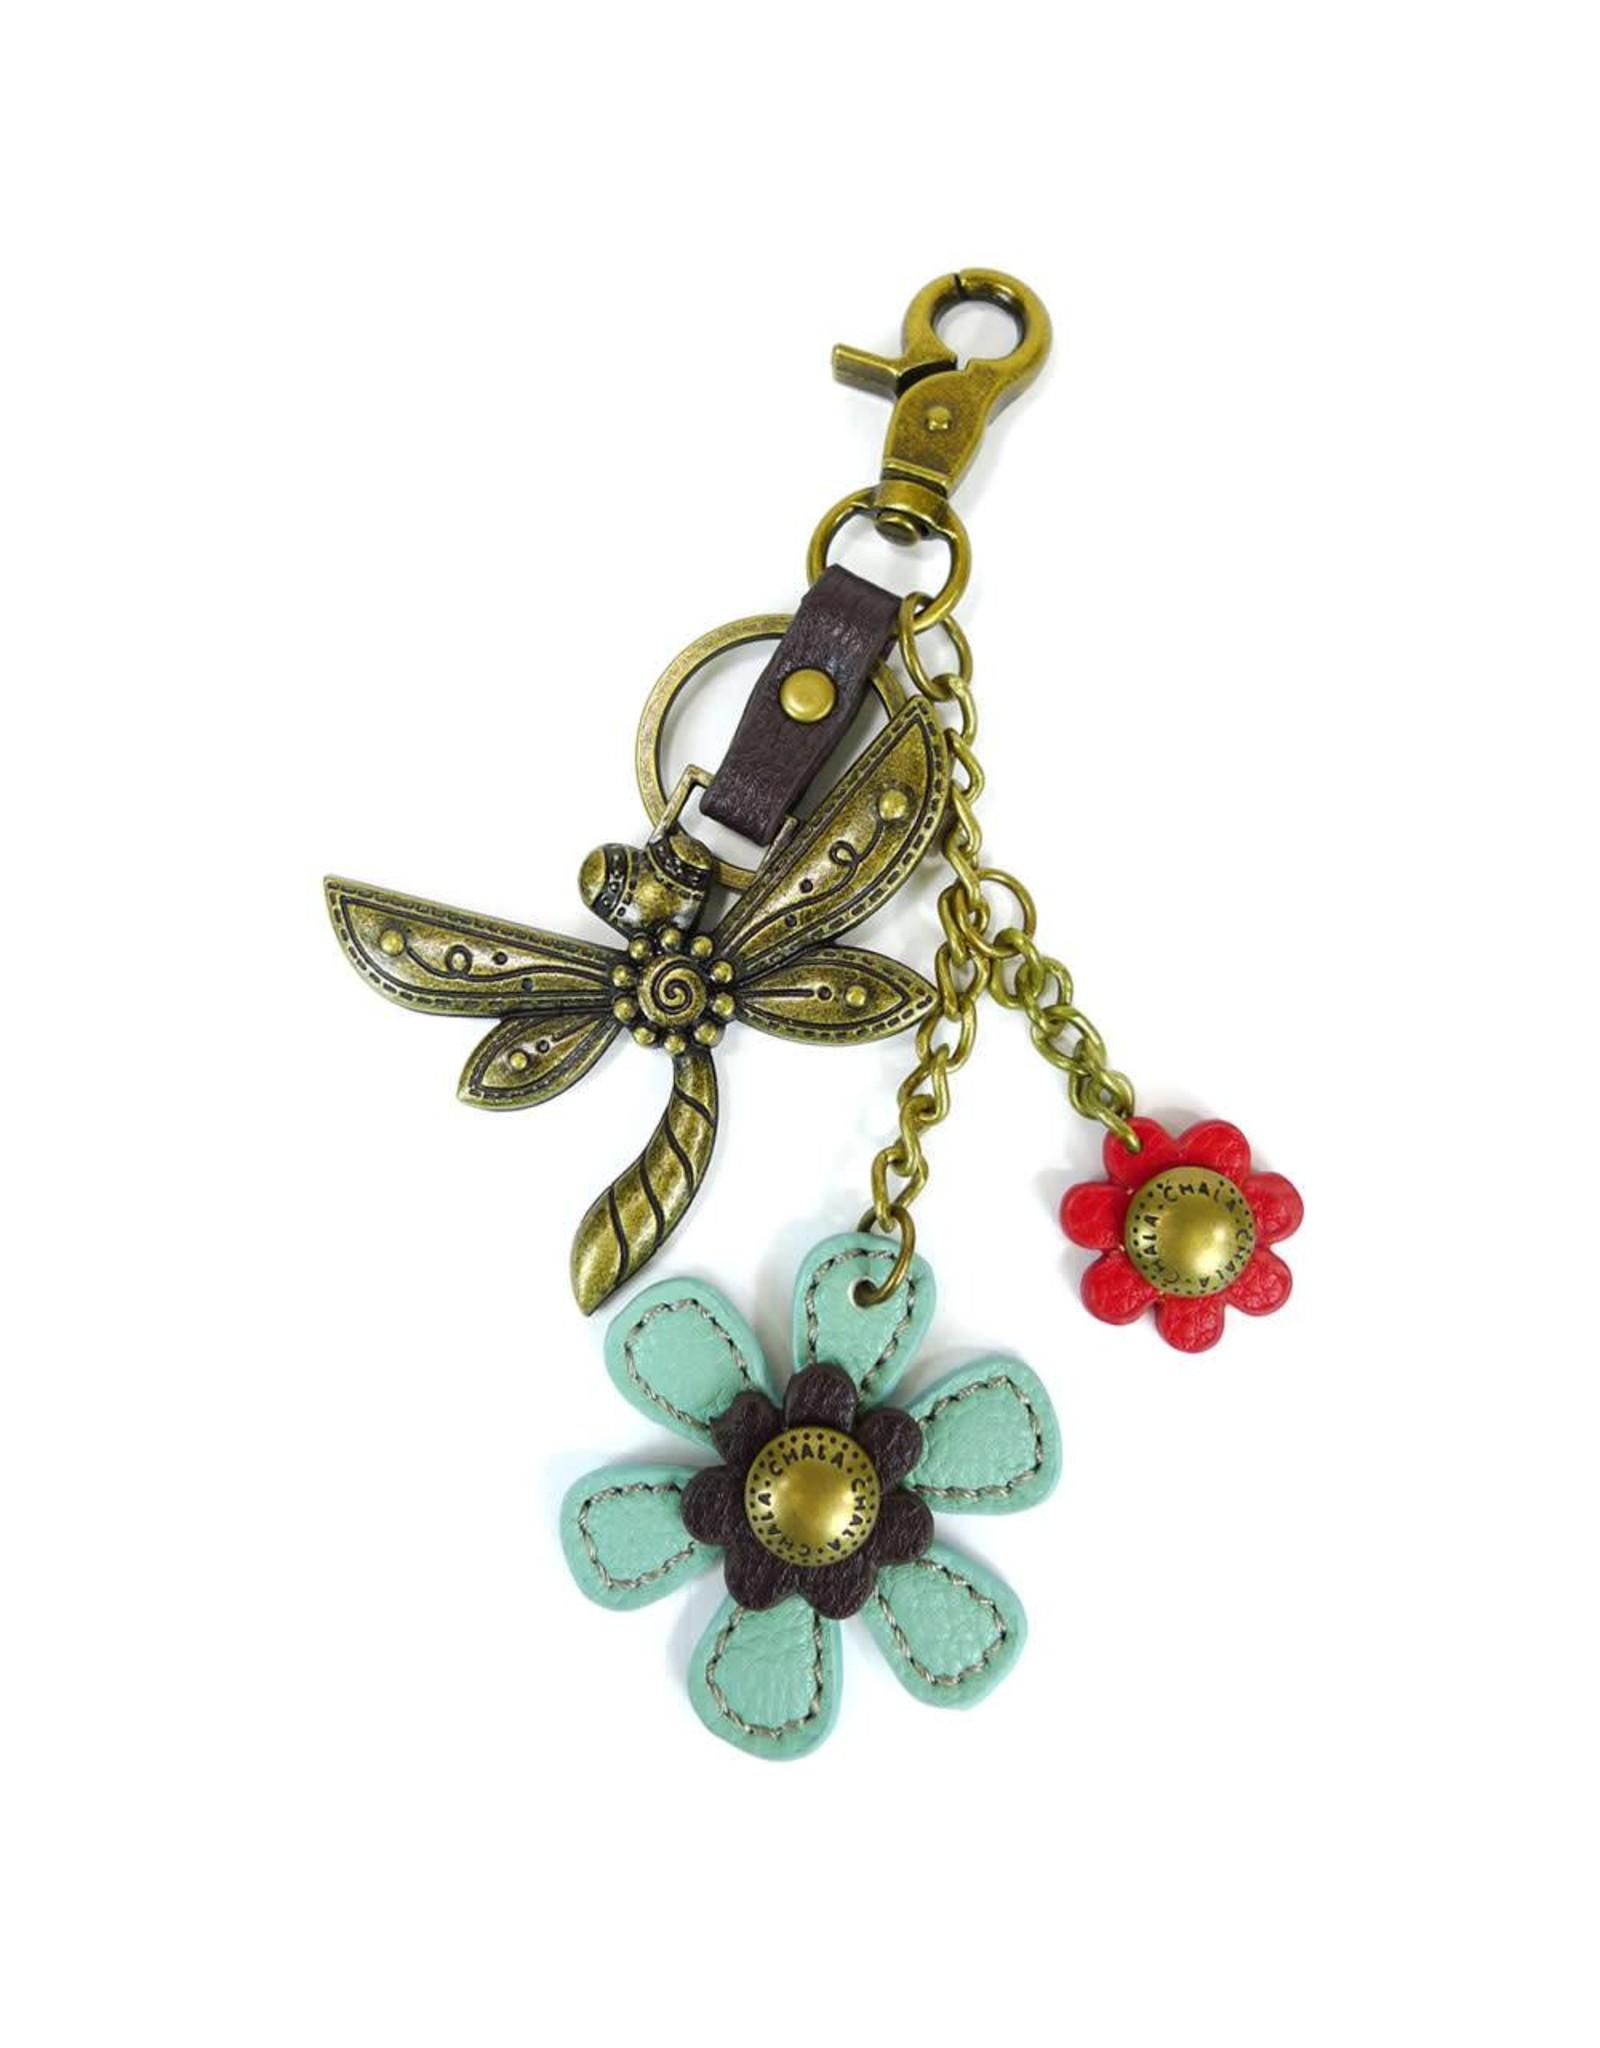 Chala Charming Key Chain Dragonfly Blue Flower